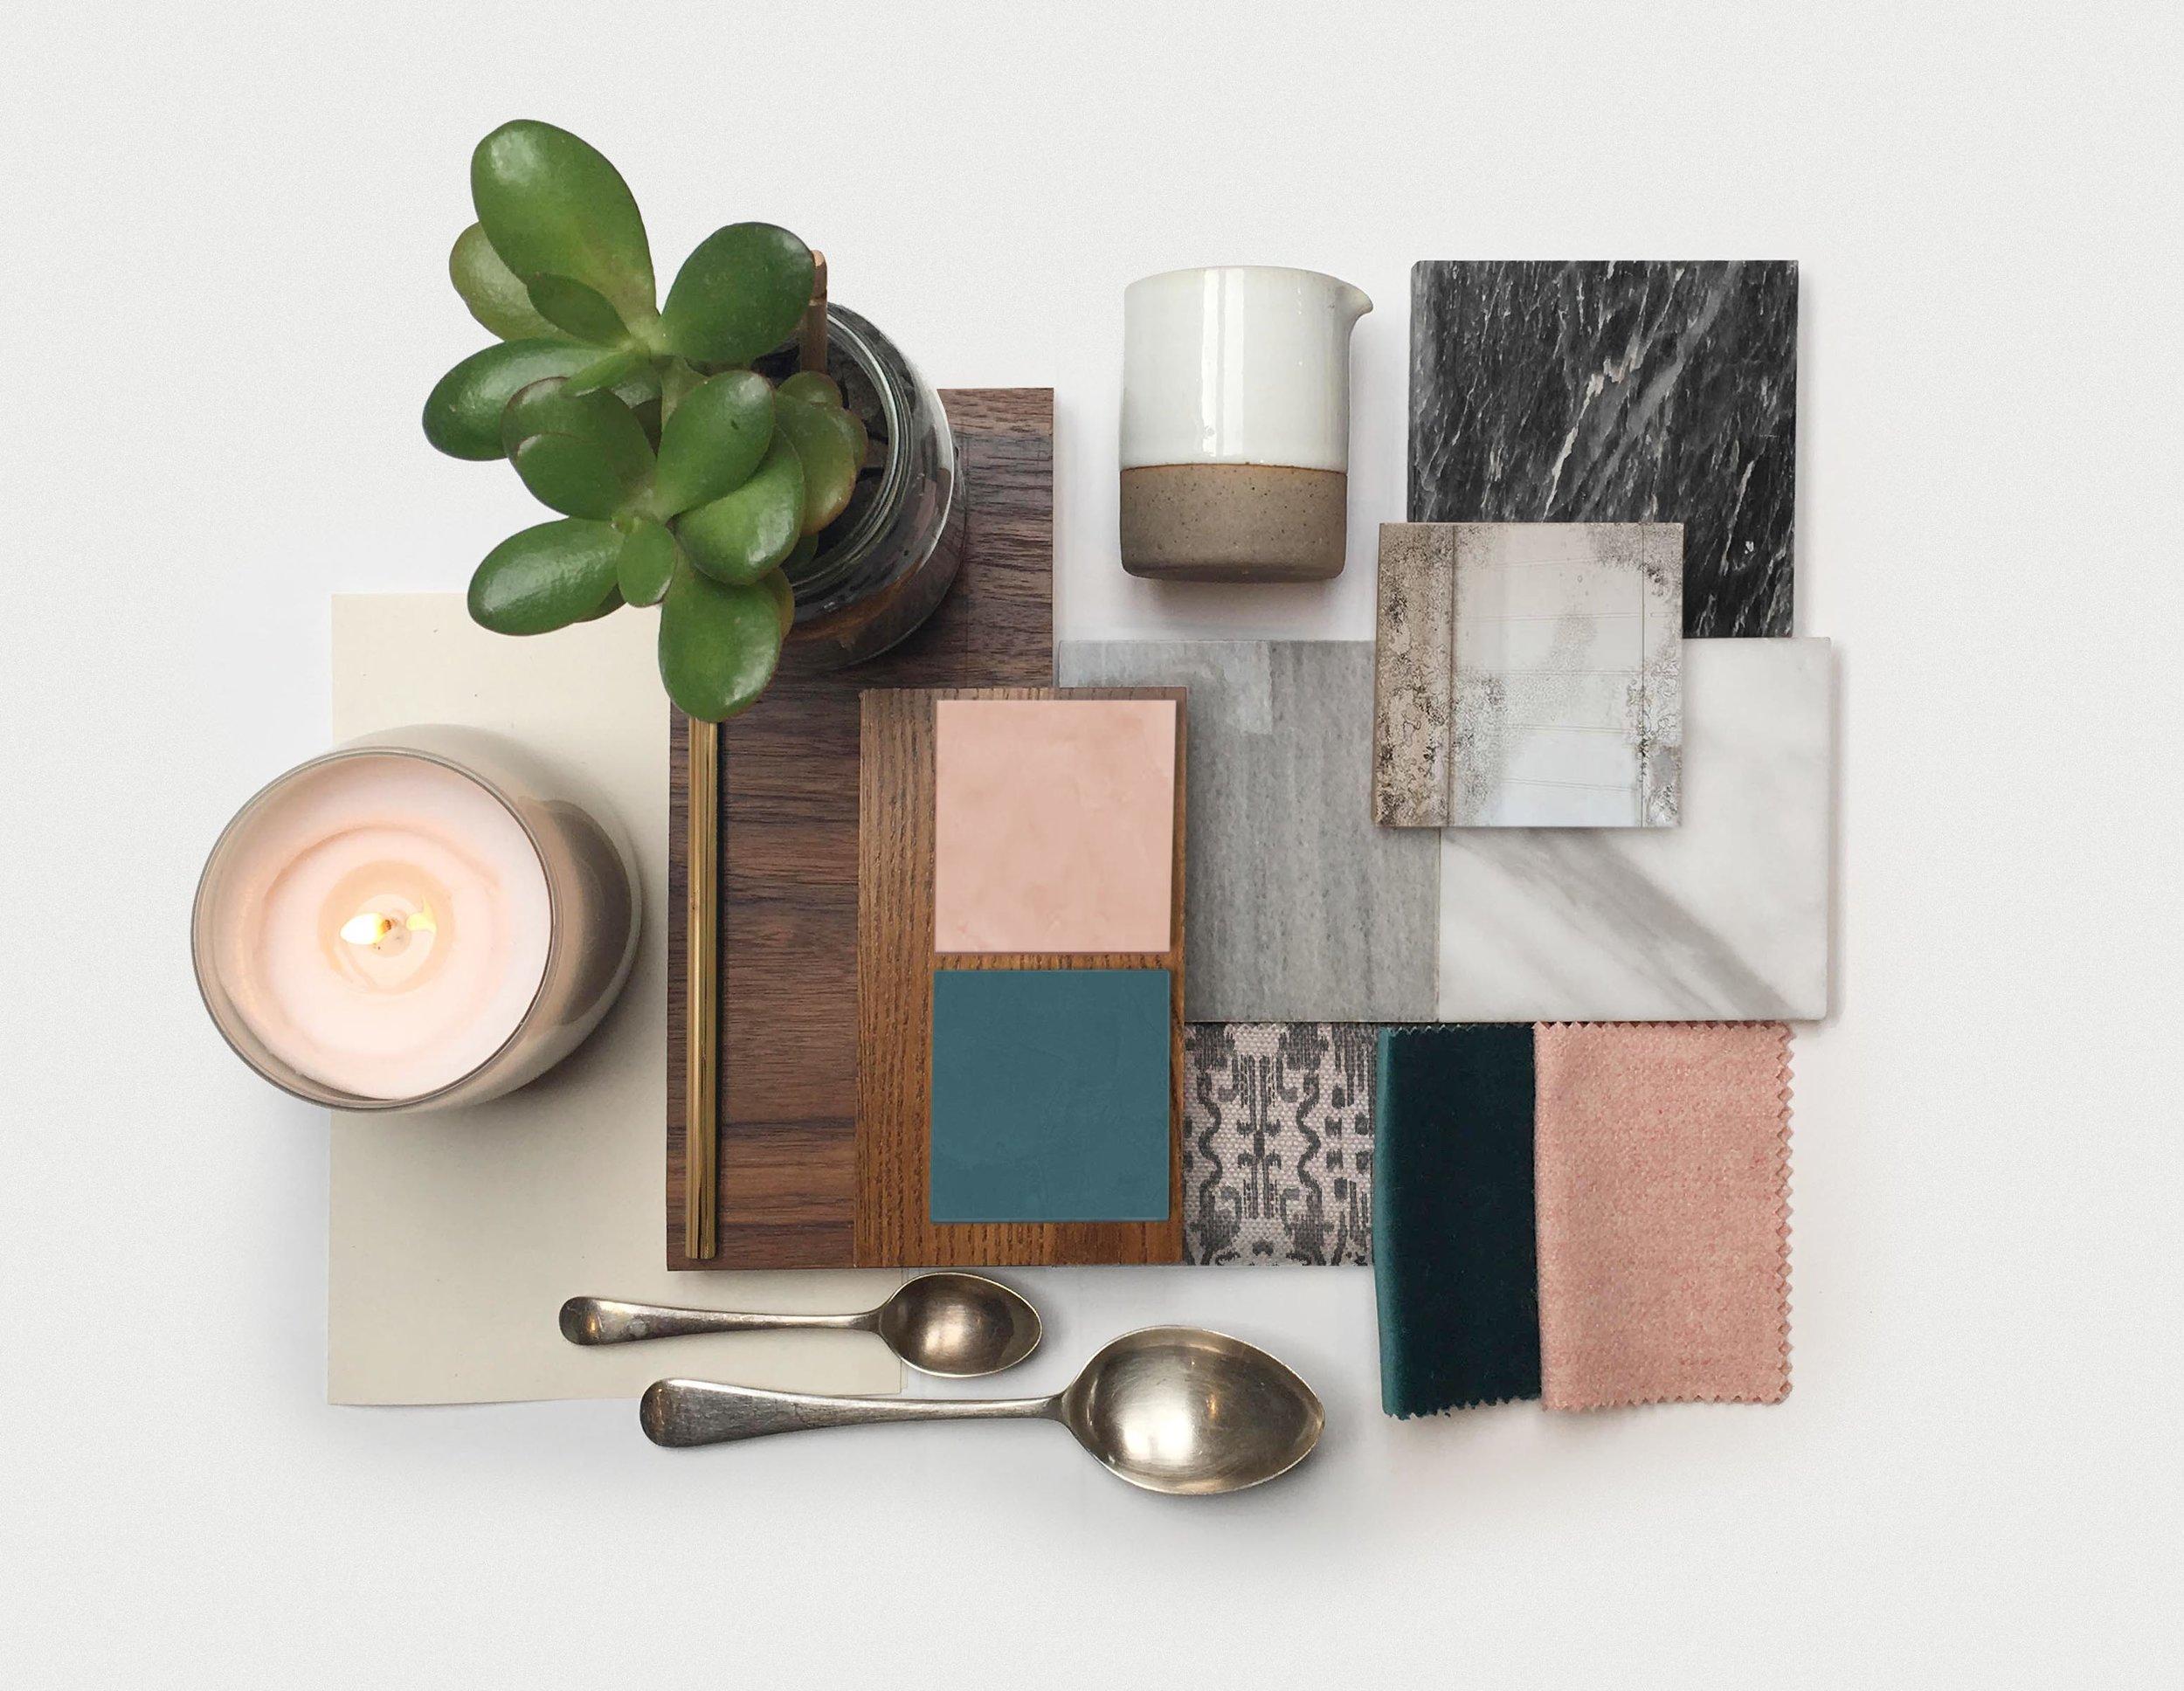 lunarlunar_interior_design_cafe_bakery_restaurant_pistachio_rose_materials_board.jpg